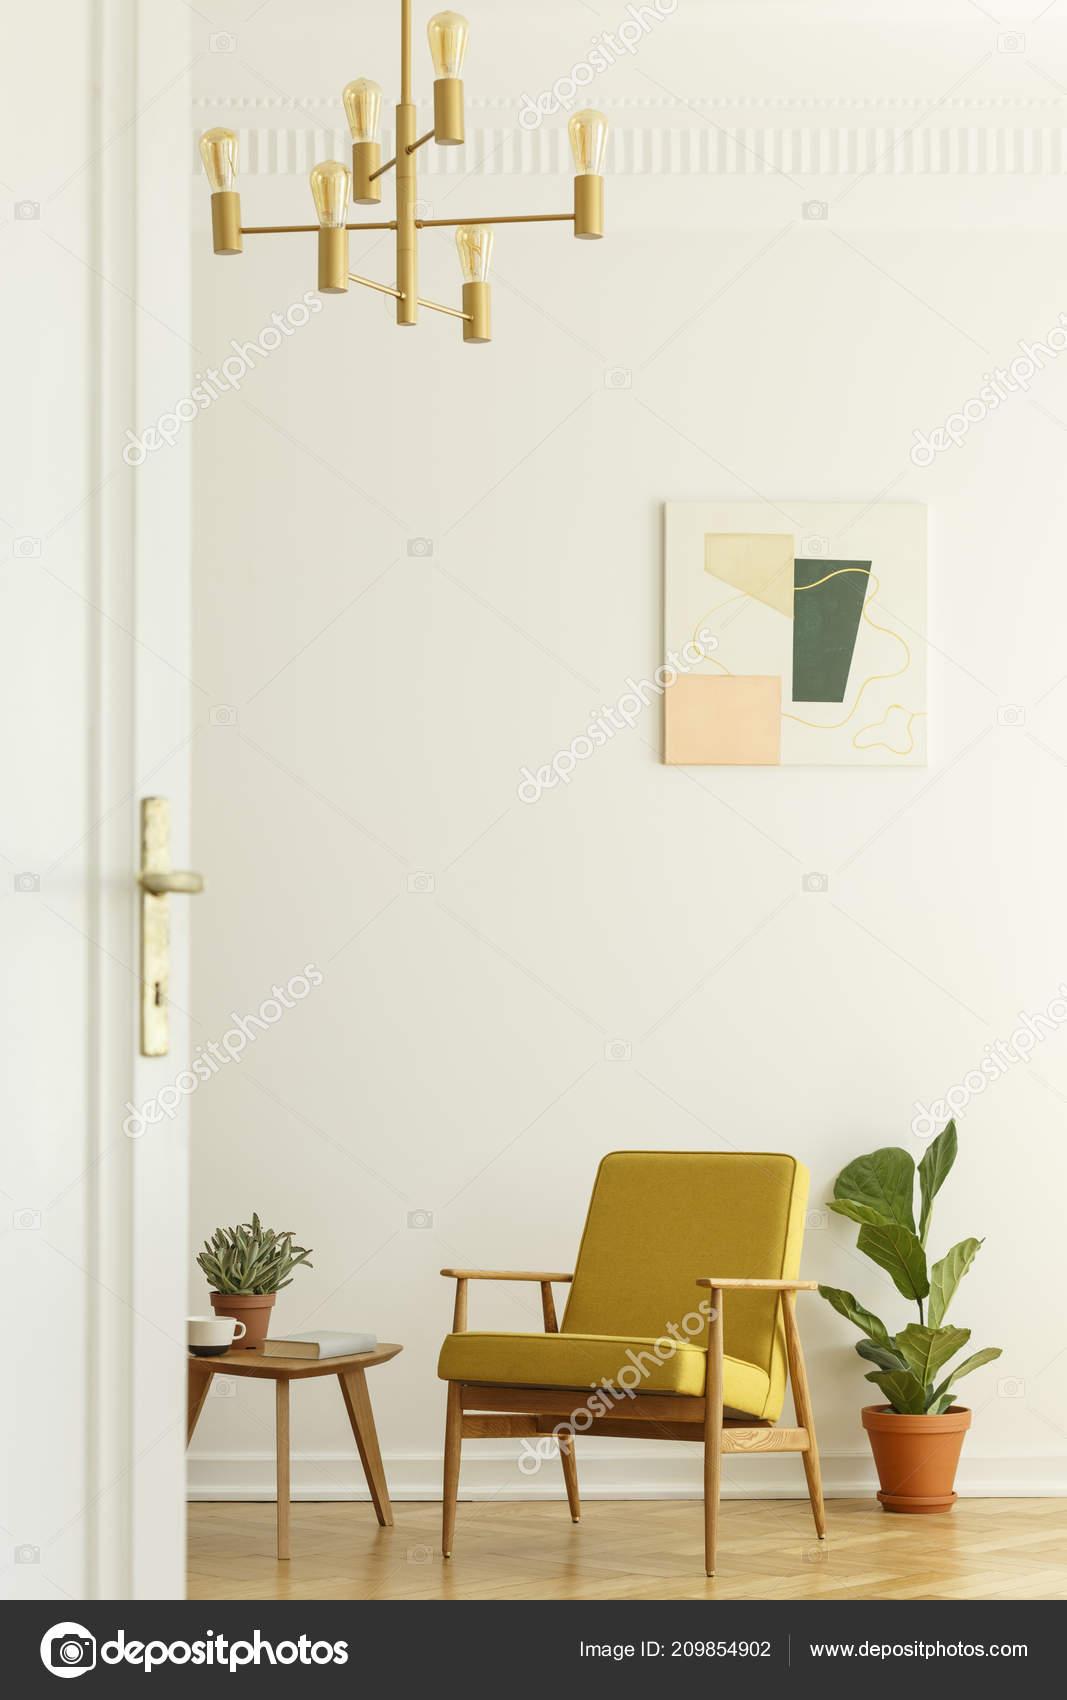 tall table and chairs for kitchen home depot cabinet refacing 舒适的黄色椅子与一个木框架在一个高大宽敞的客厅内部与海报在白色的墙上 舒适的黄色椅子与一个木框架在一个高大宽敞的客厅内部与